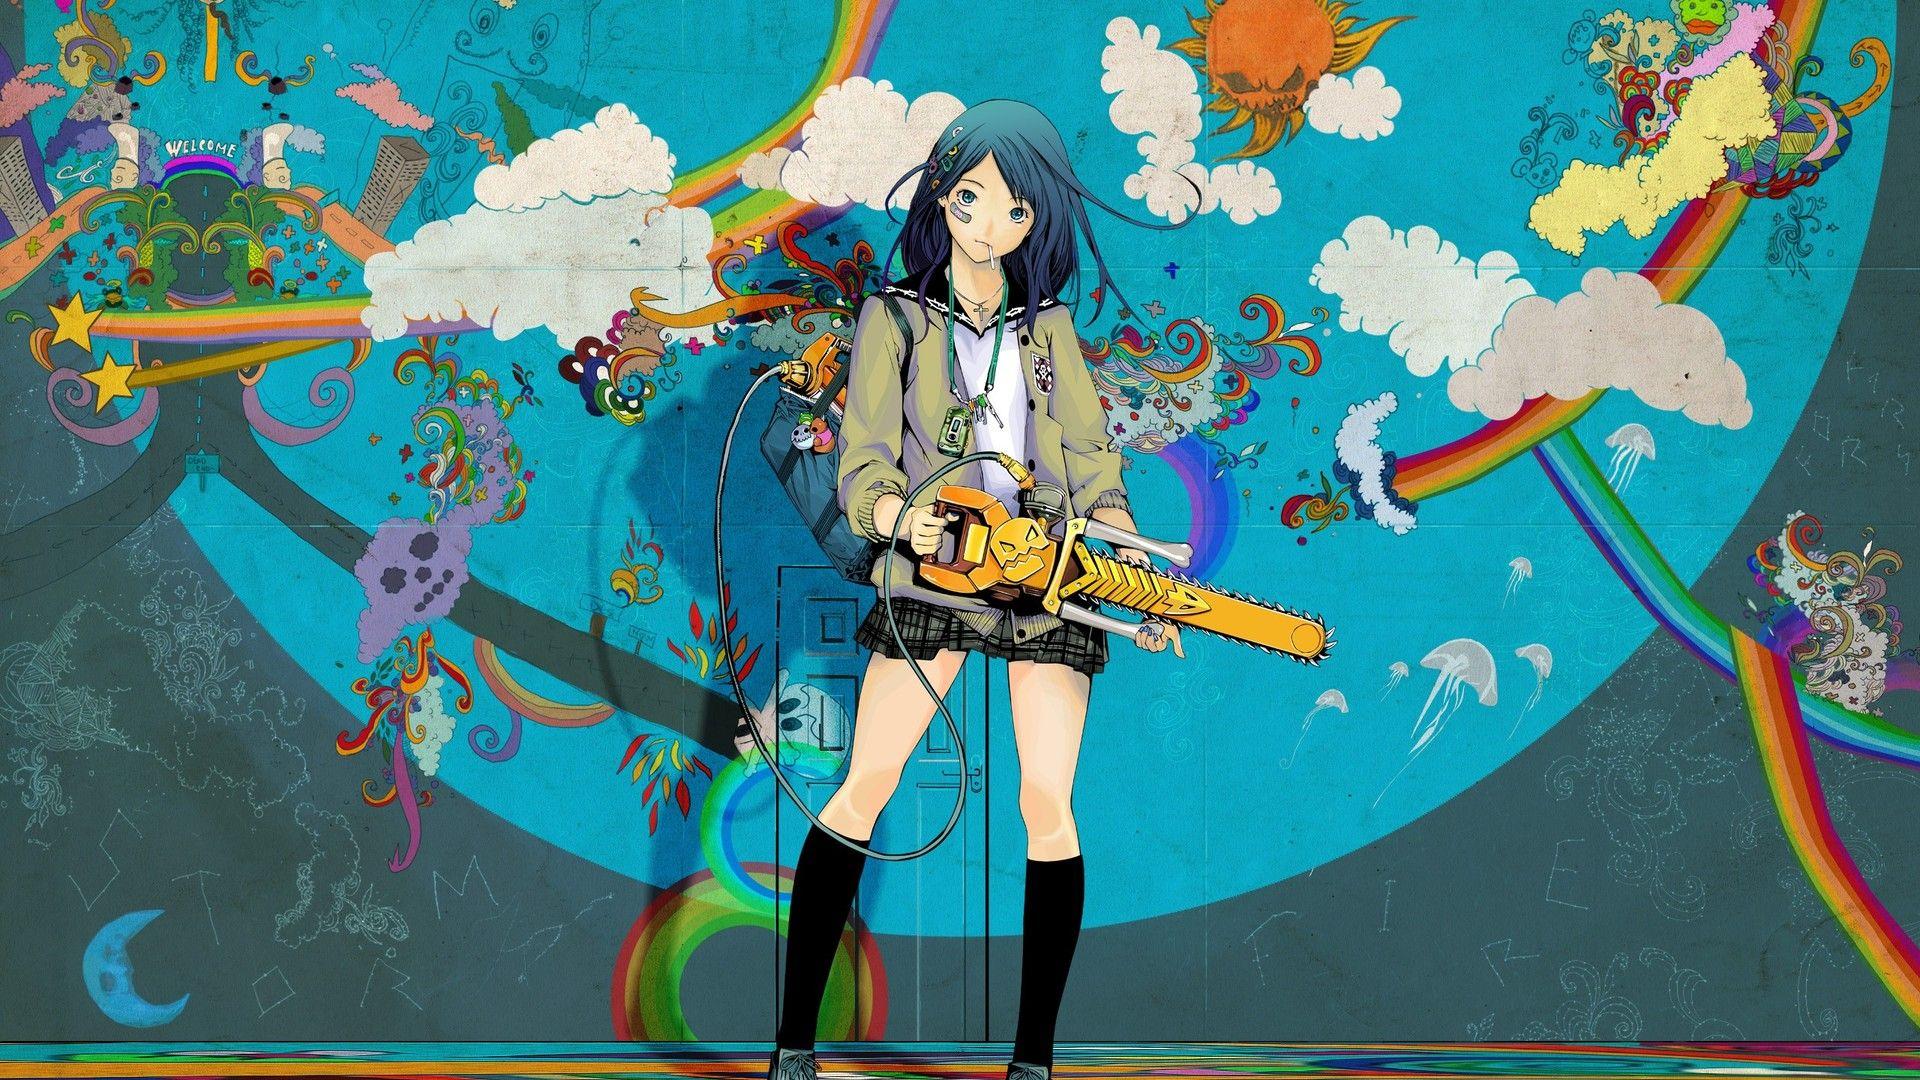 Hd wallpaper kawaii - Dark Anime Girl Kawaii Colorful Hd Desktop Backgrounds Bloody Berry Pinterest Dark Anime Girl Dark Anime And Hd Desktop